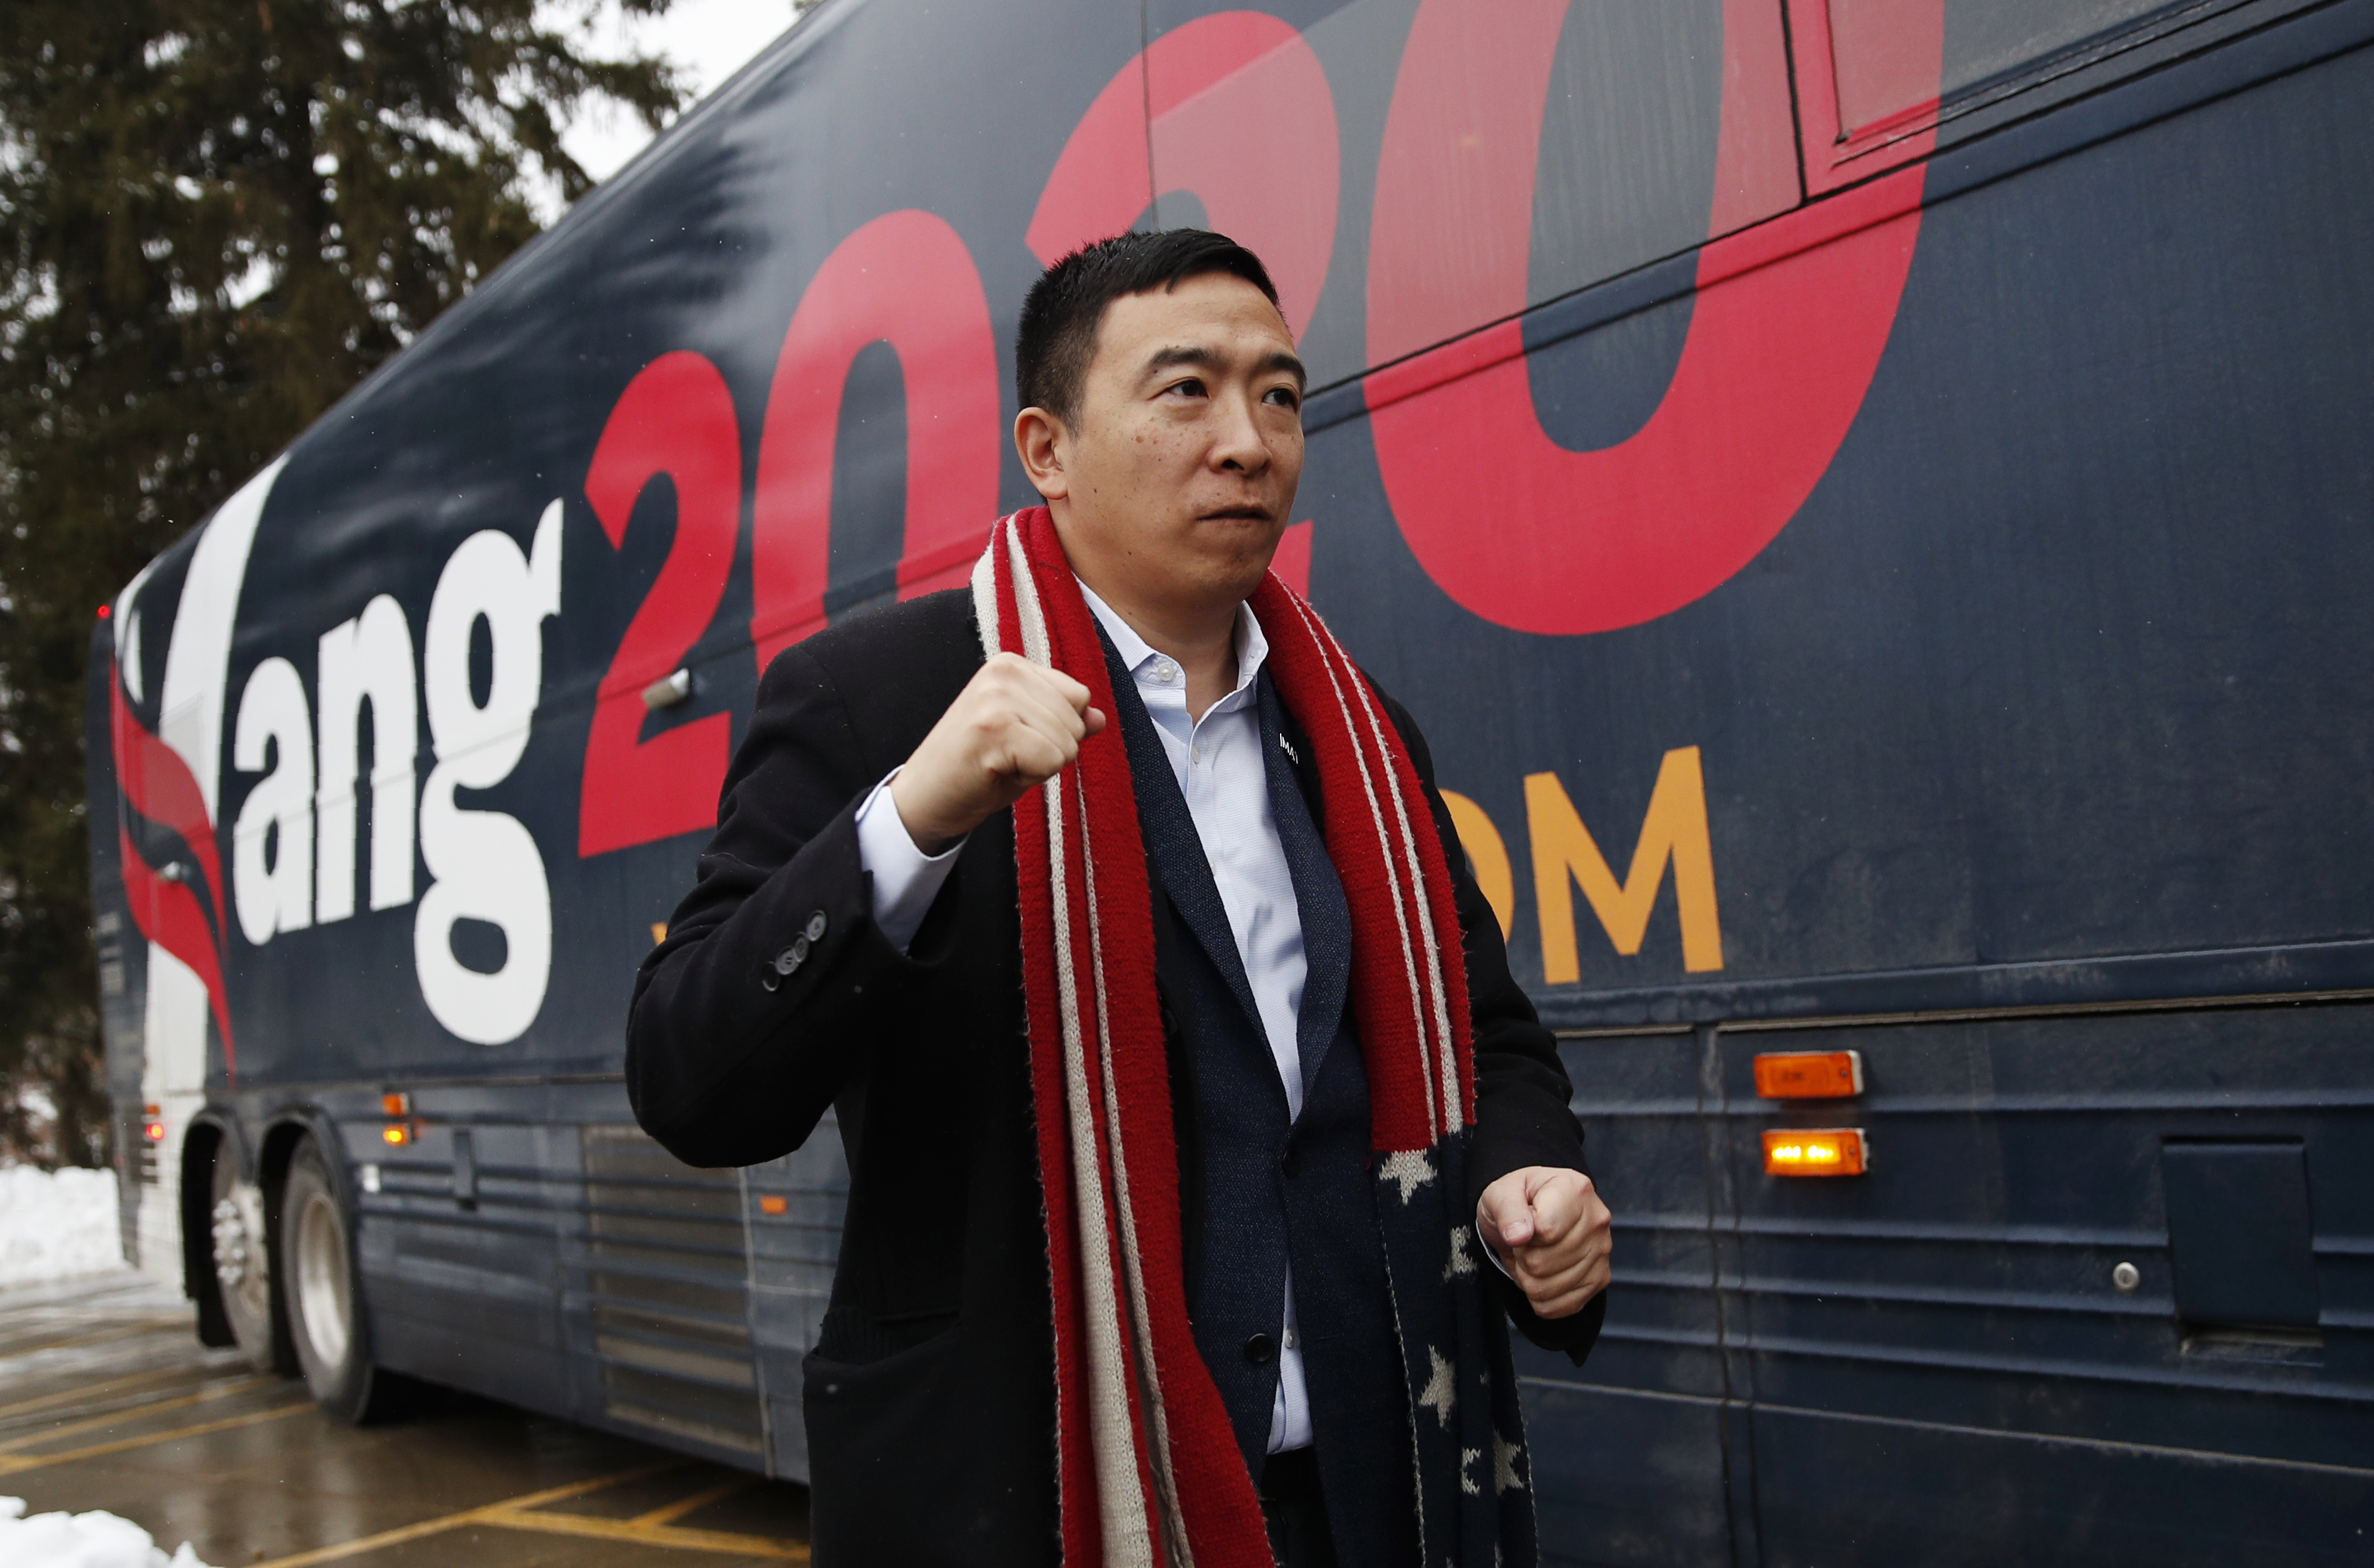 Andrew Yang qualifies for Democratic debate on February 7